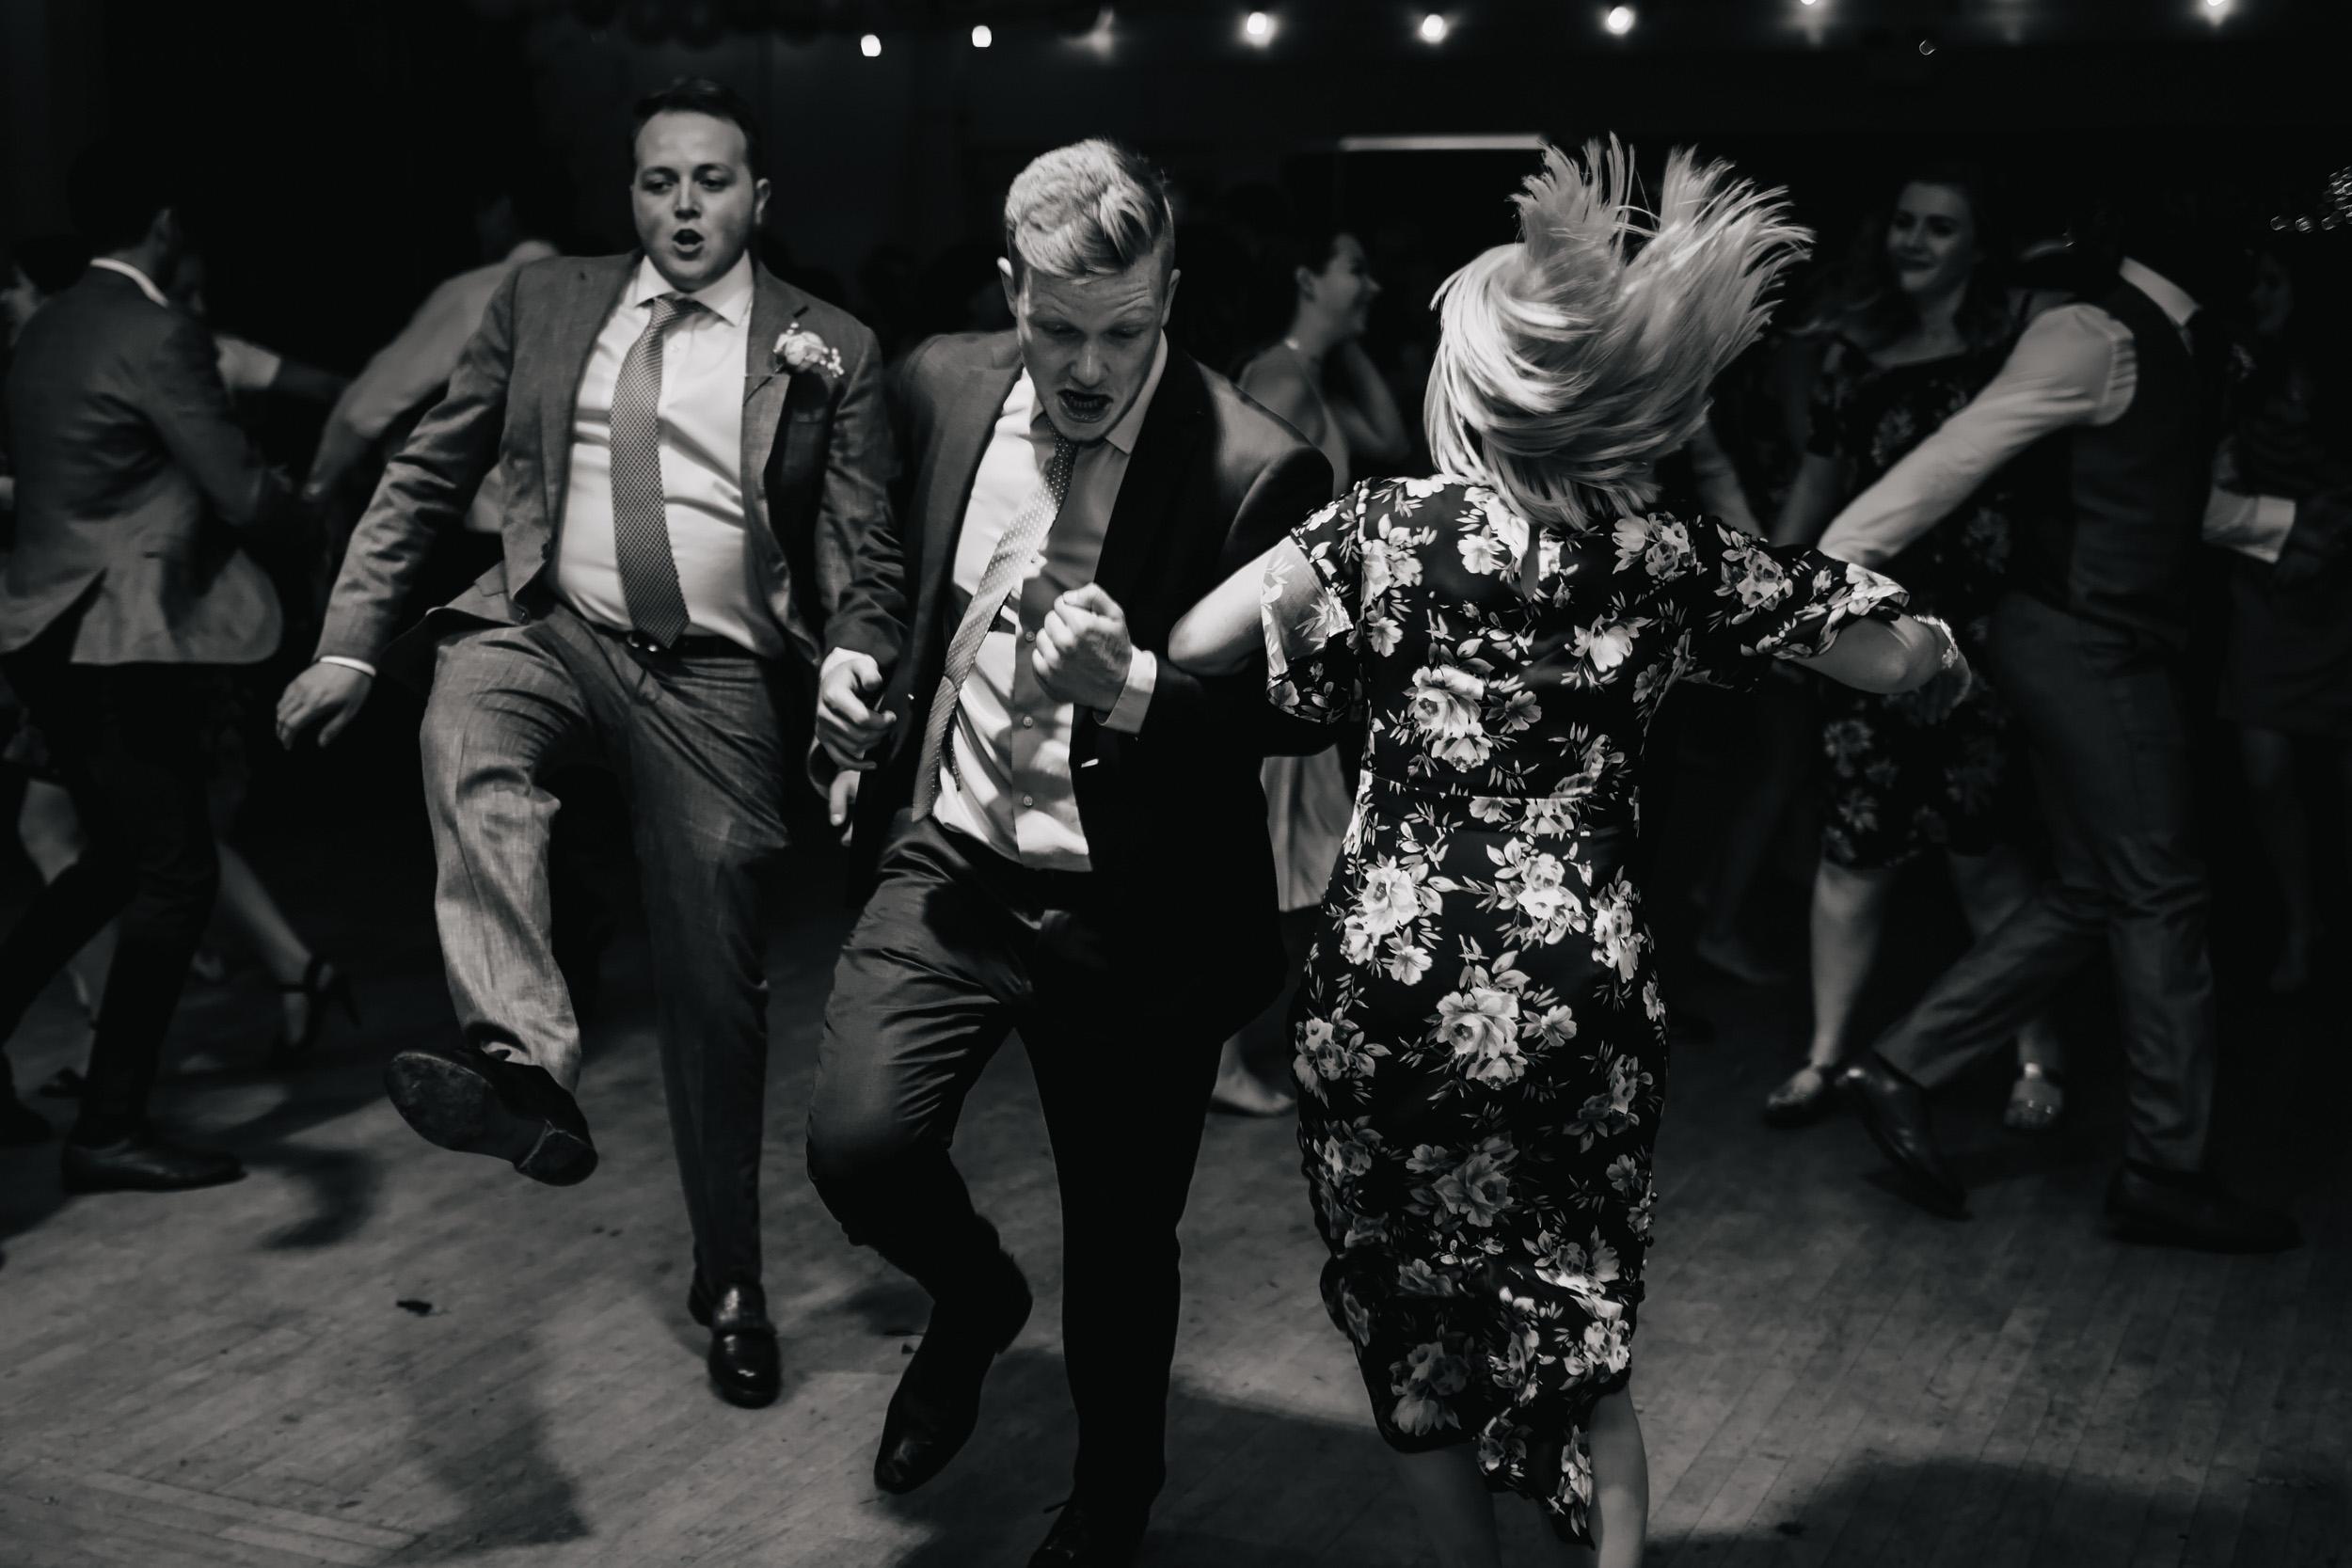 Wedding guests ceilidh dancing in Lancashire